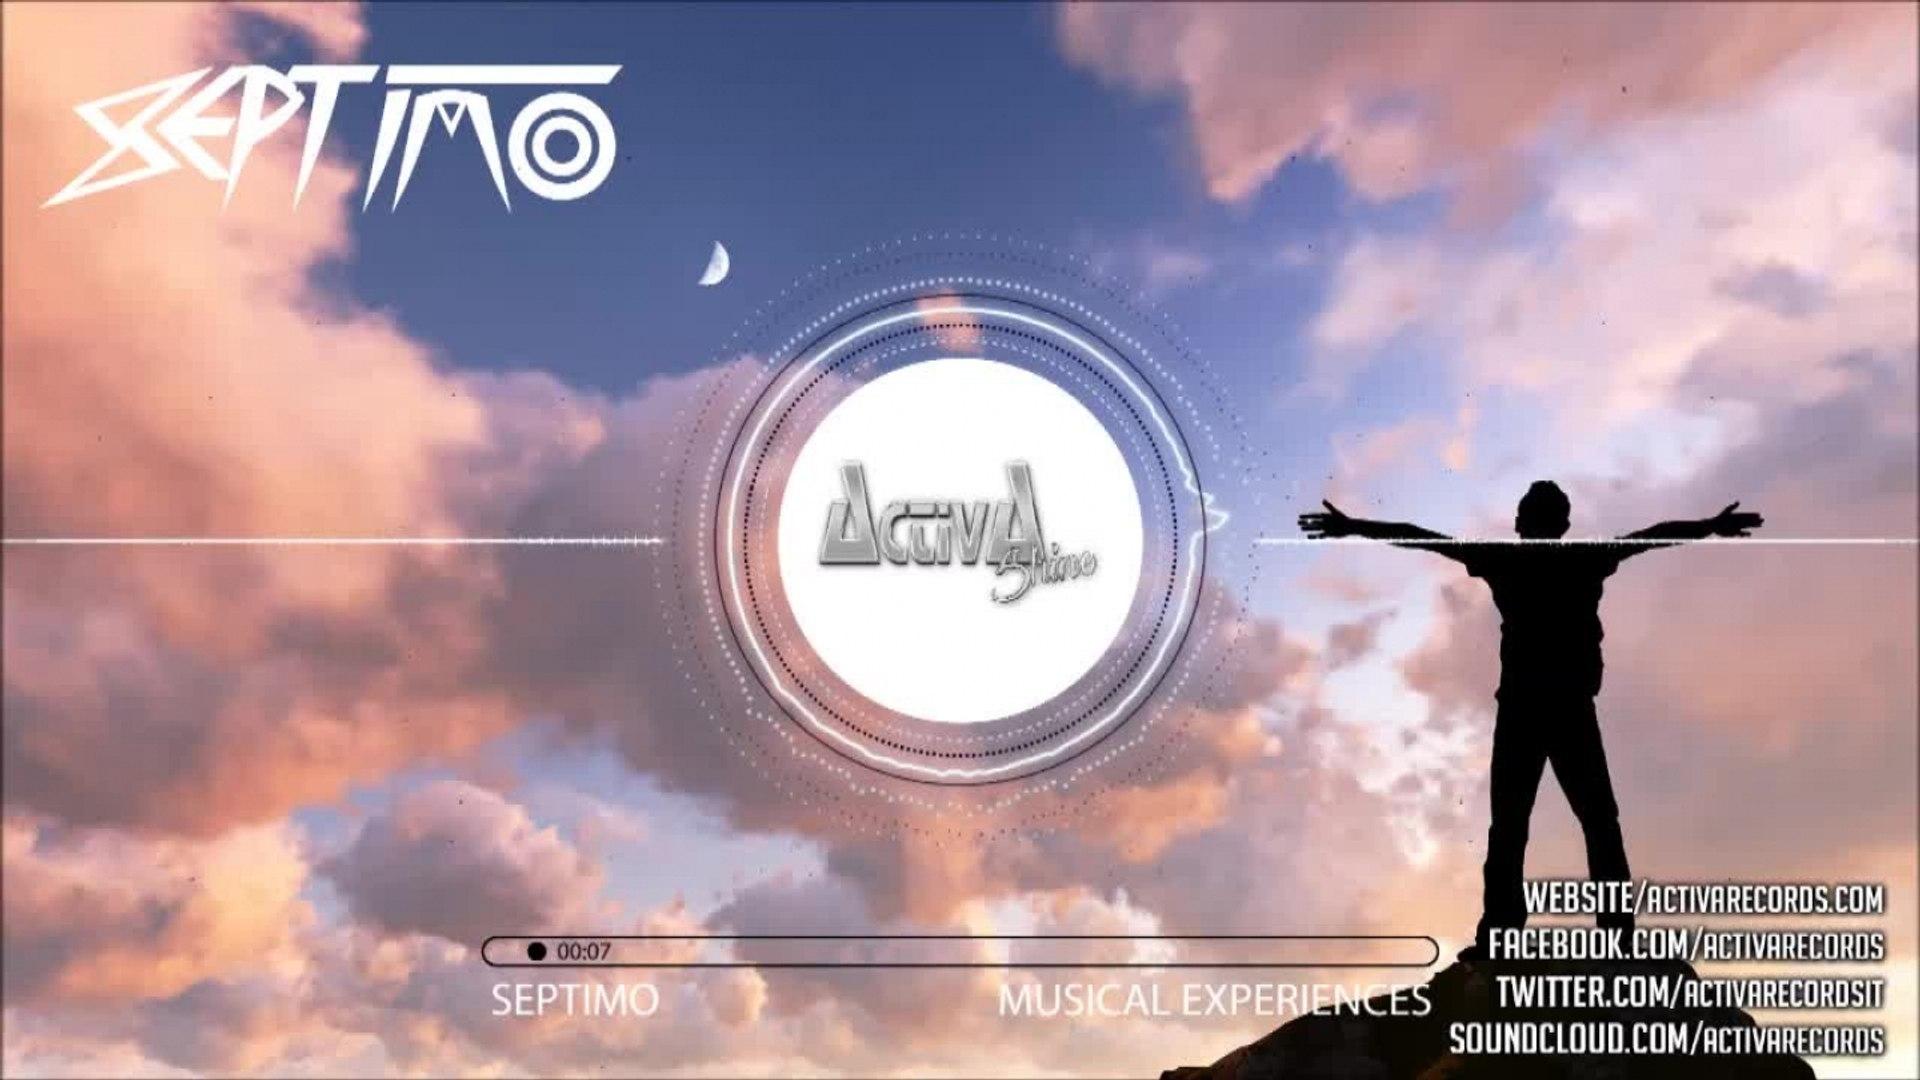 Septimo - Musical Experiences (Original Mix) - Official Preview (Activa Shine)